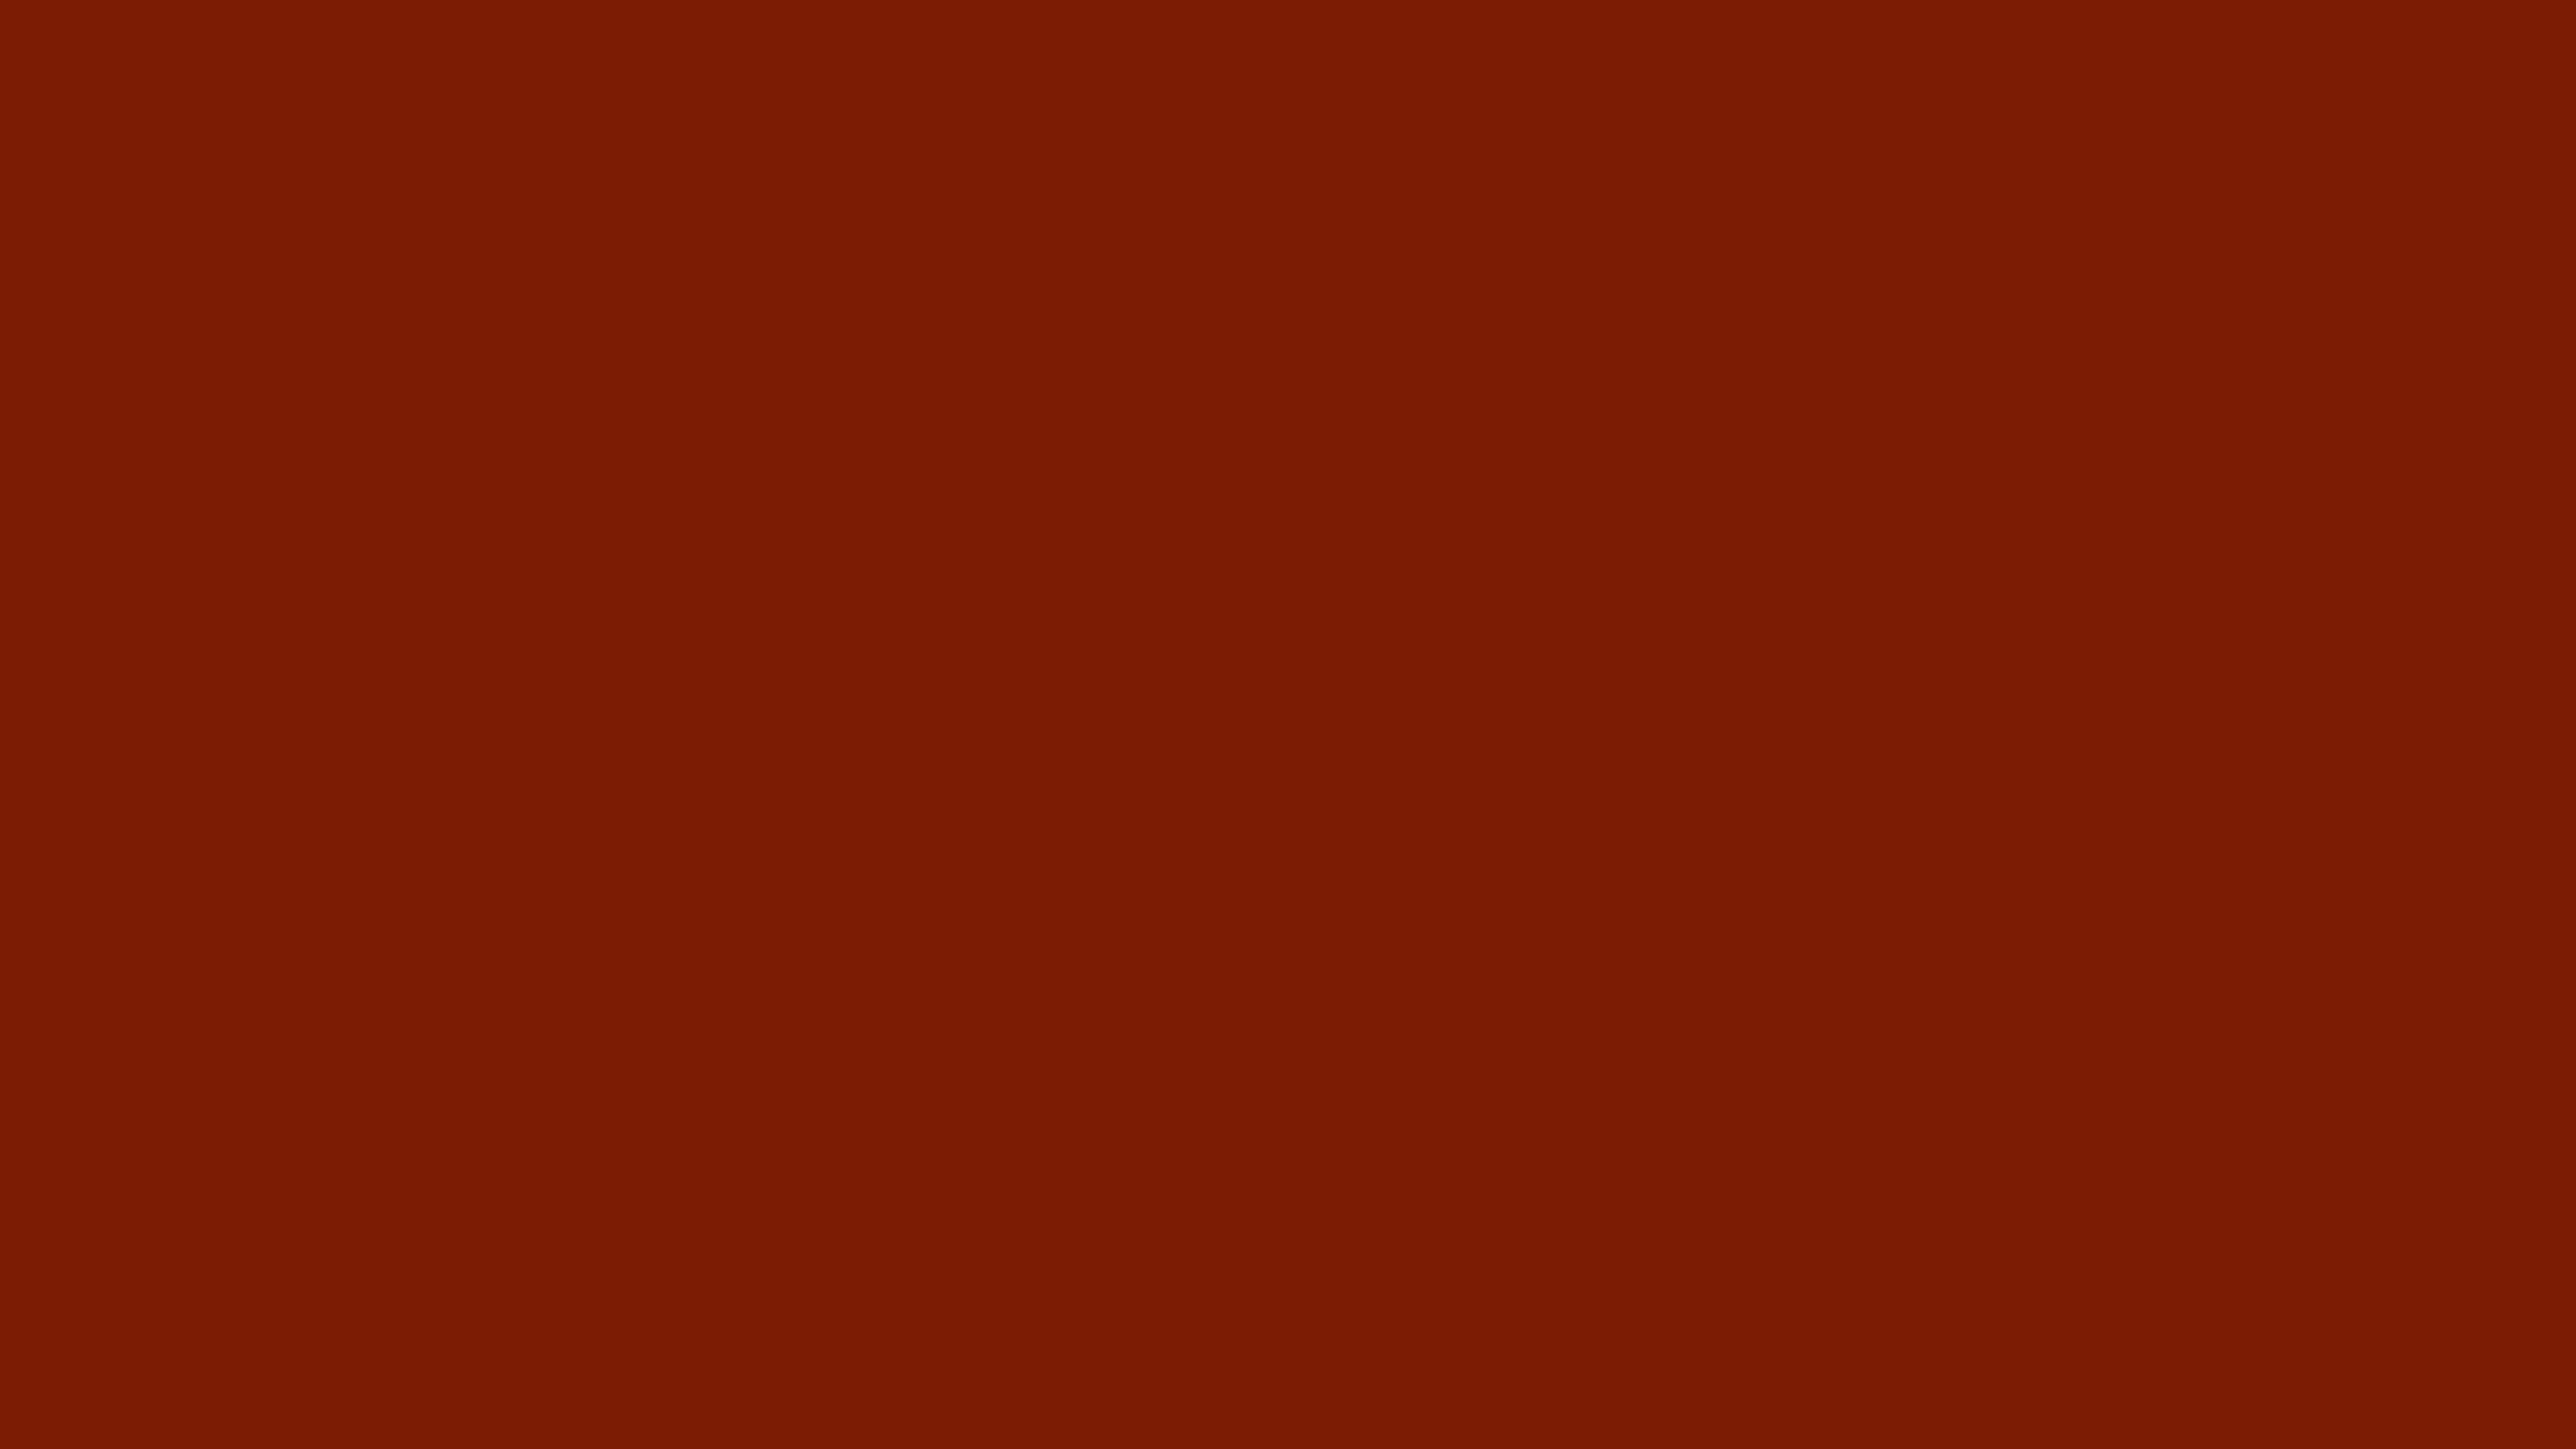 5120x2880 Kenyan Copper Solid Color Background